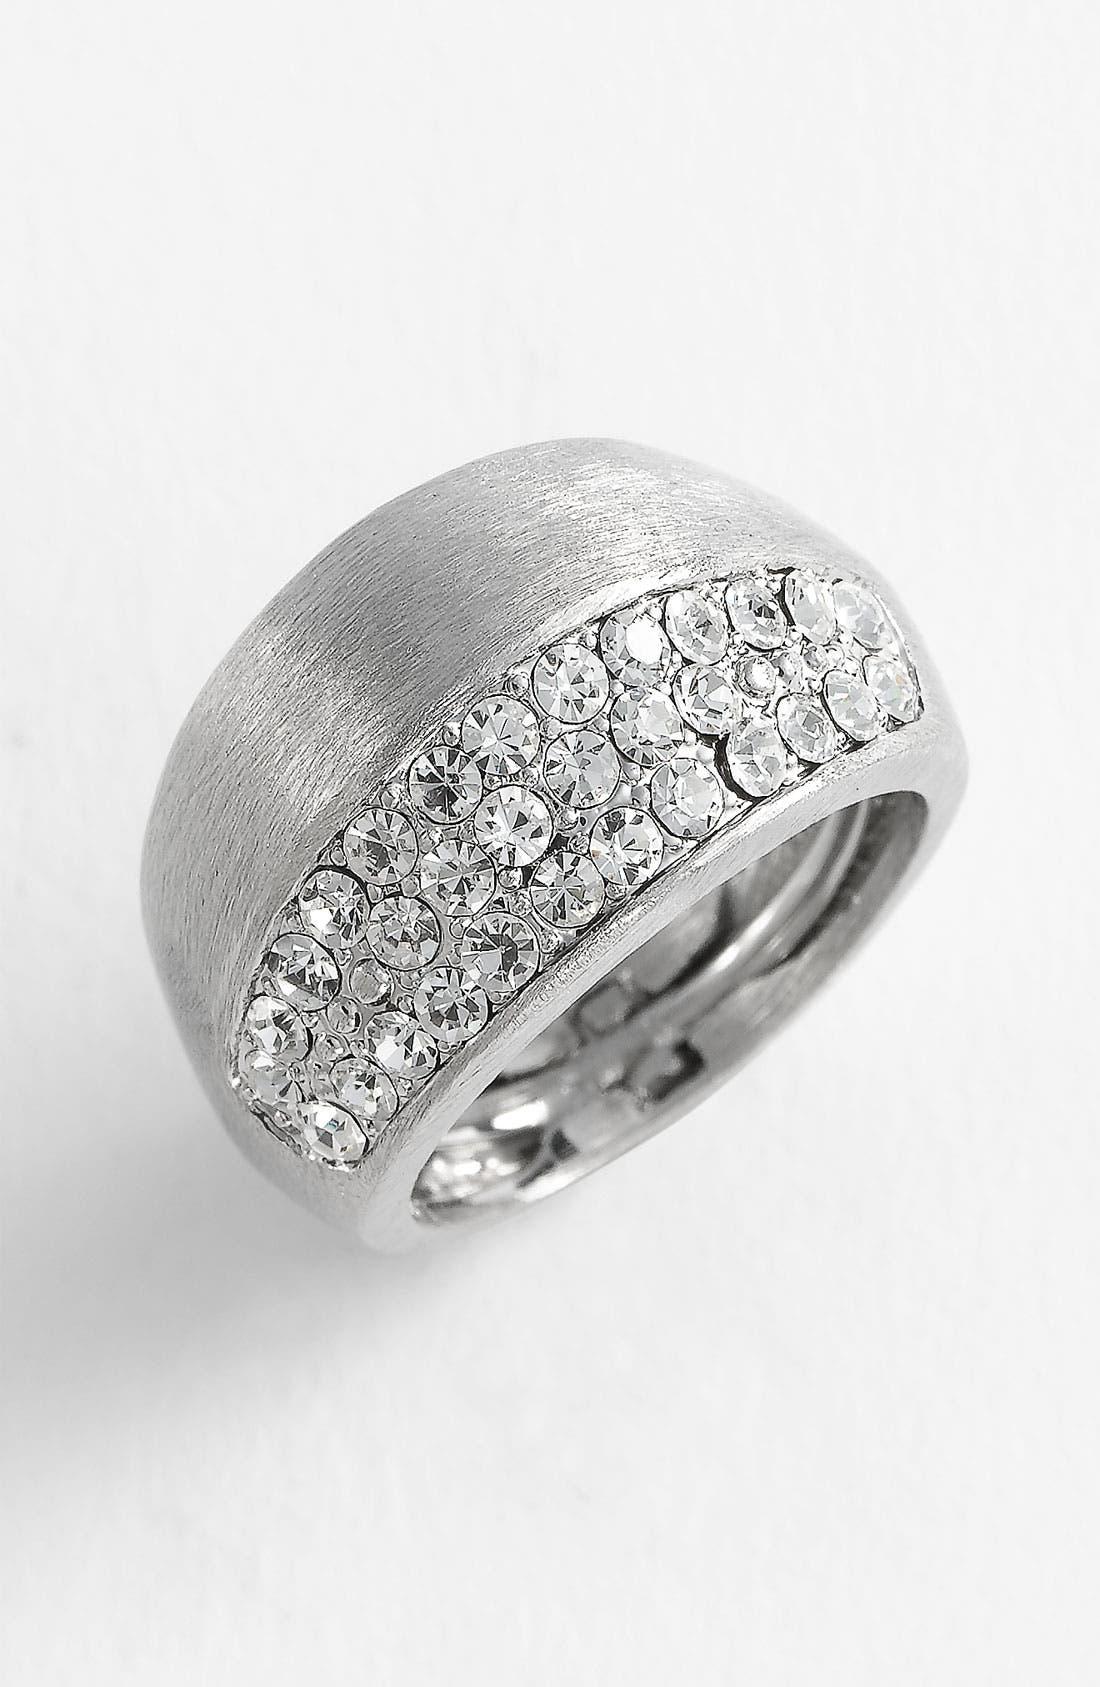 Main Image - Ariella Collection Metal & Crystal Ring